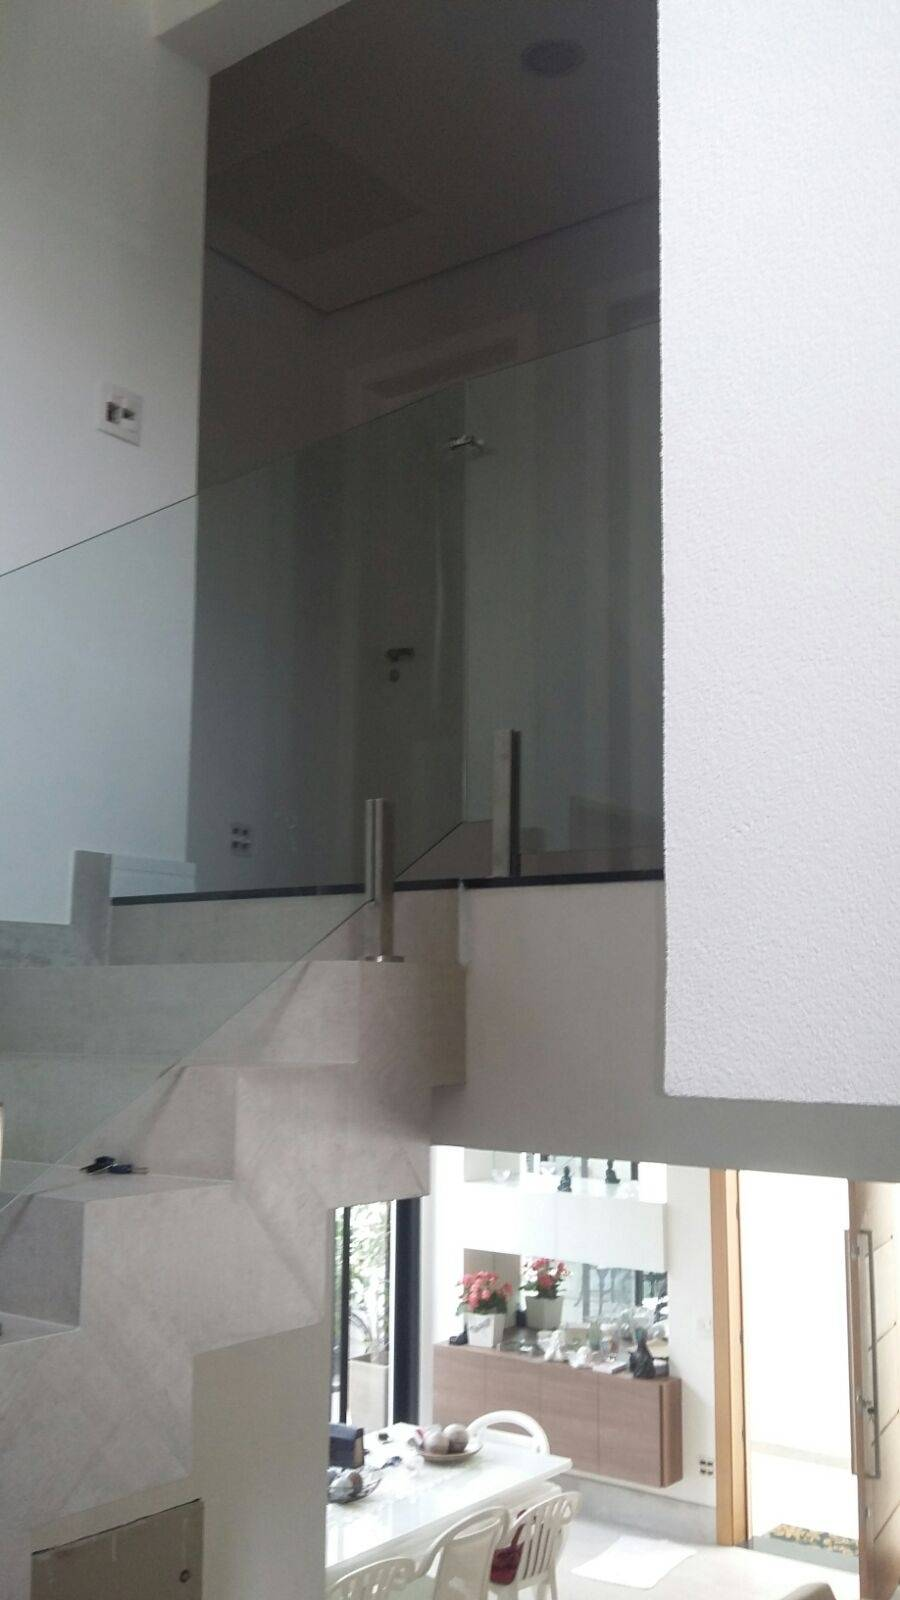 Loja de Guarda-corpo de Vidro Fumê em Belém - Guarda-corpo de Vidro para Varanda